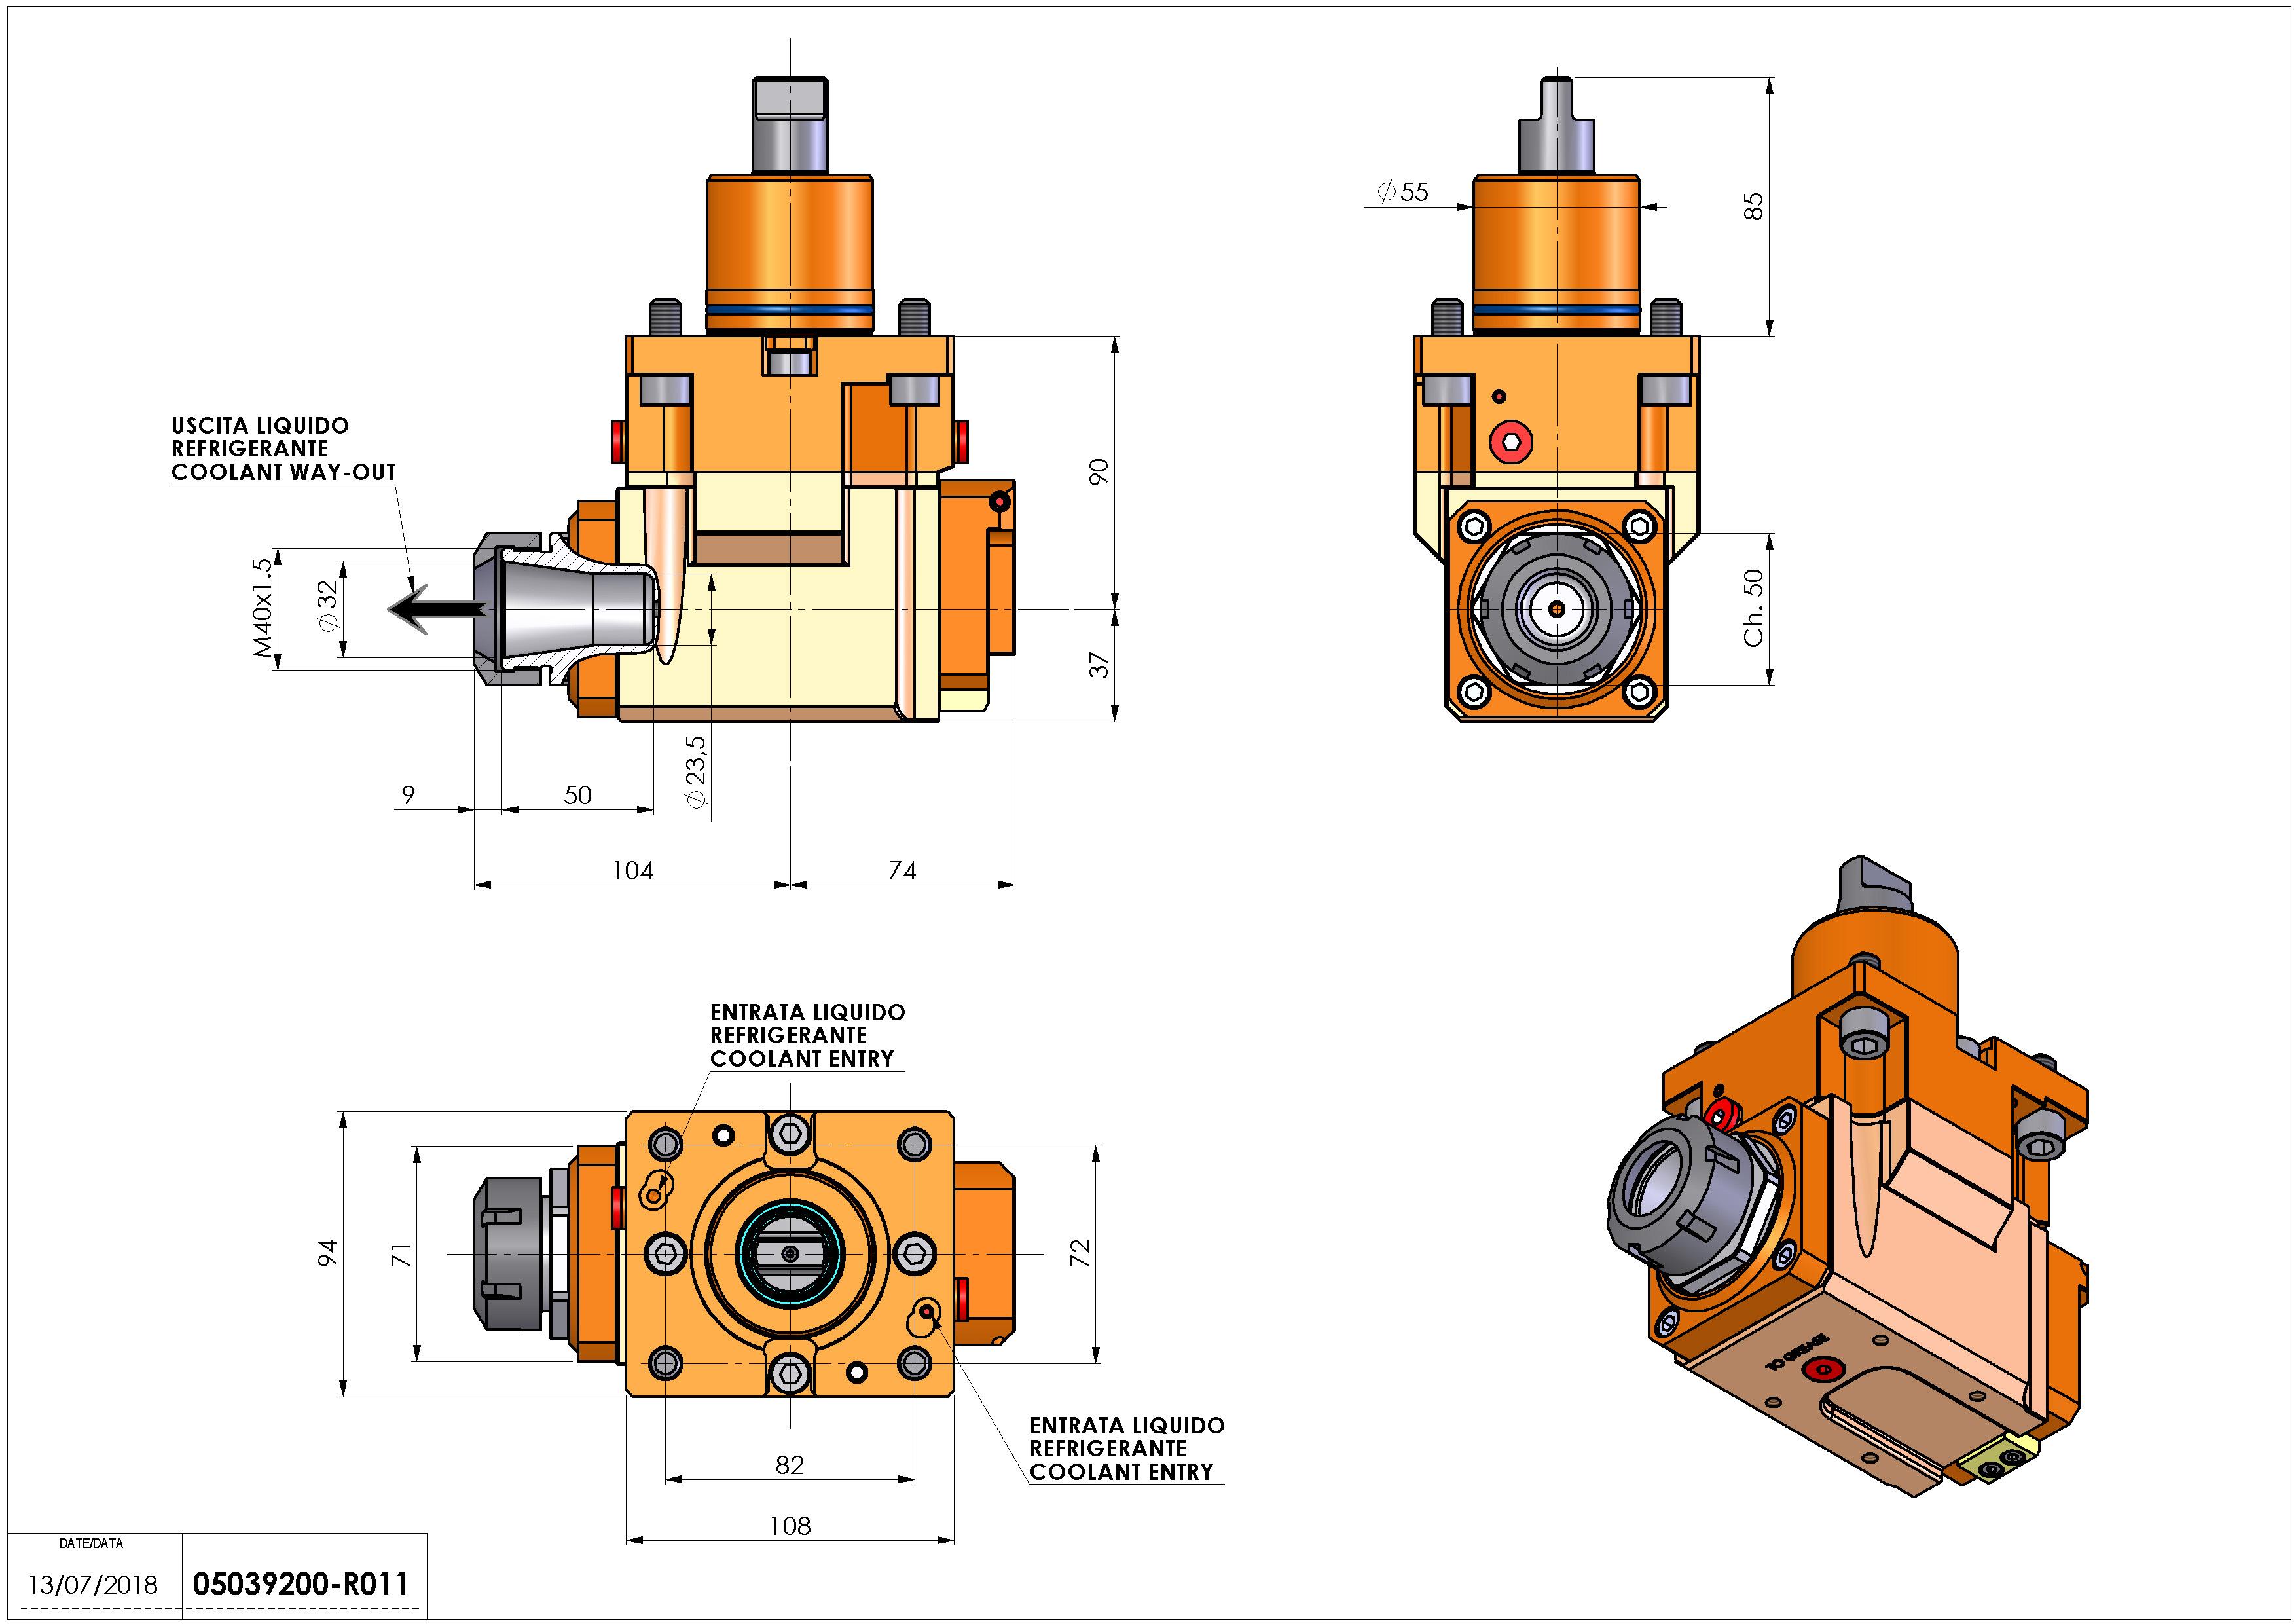 Technical image - LT-A D55 ER32 LR HRF H90.